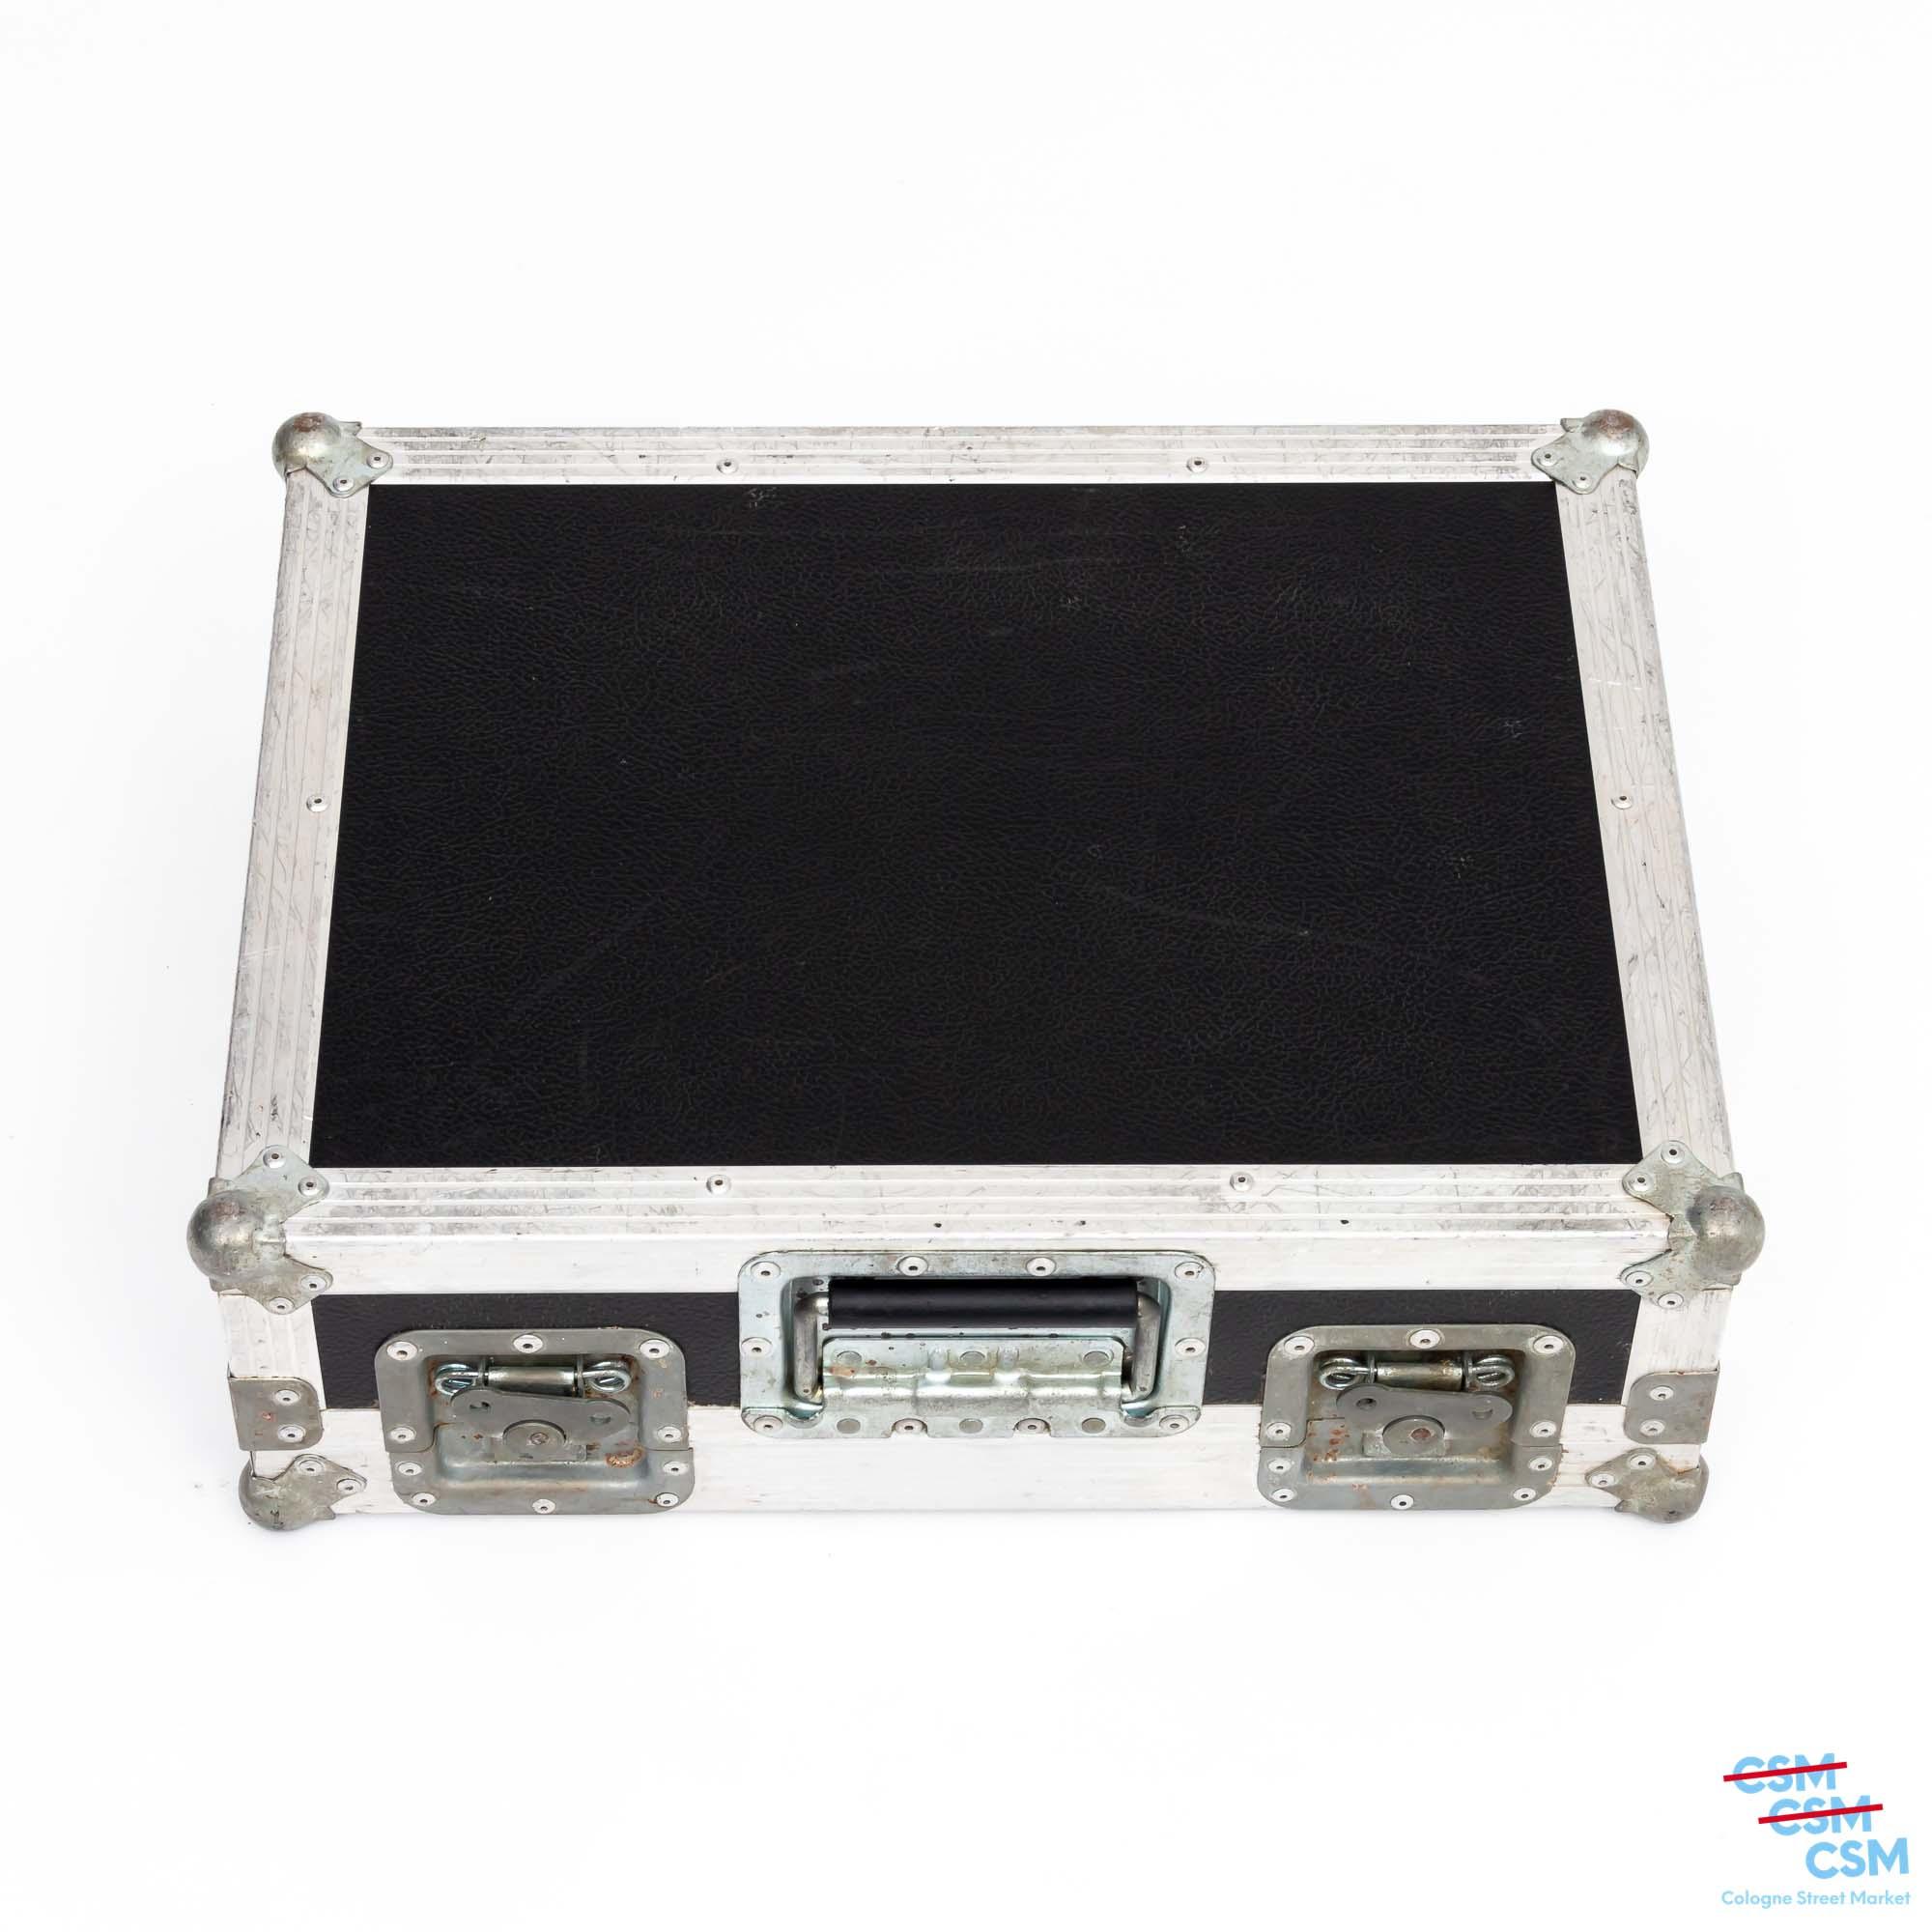 Fligthcase DJM 900 Nexus gebraucht 1